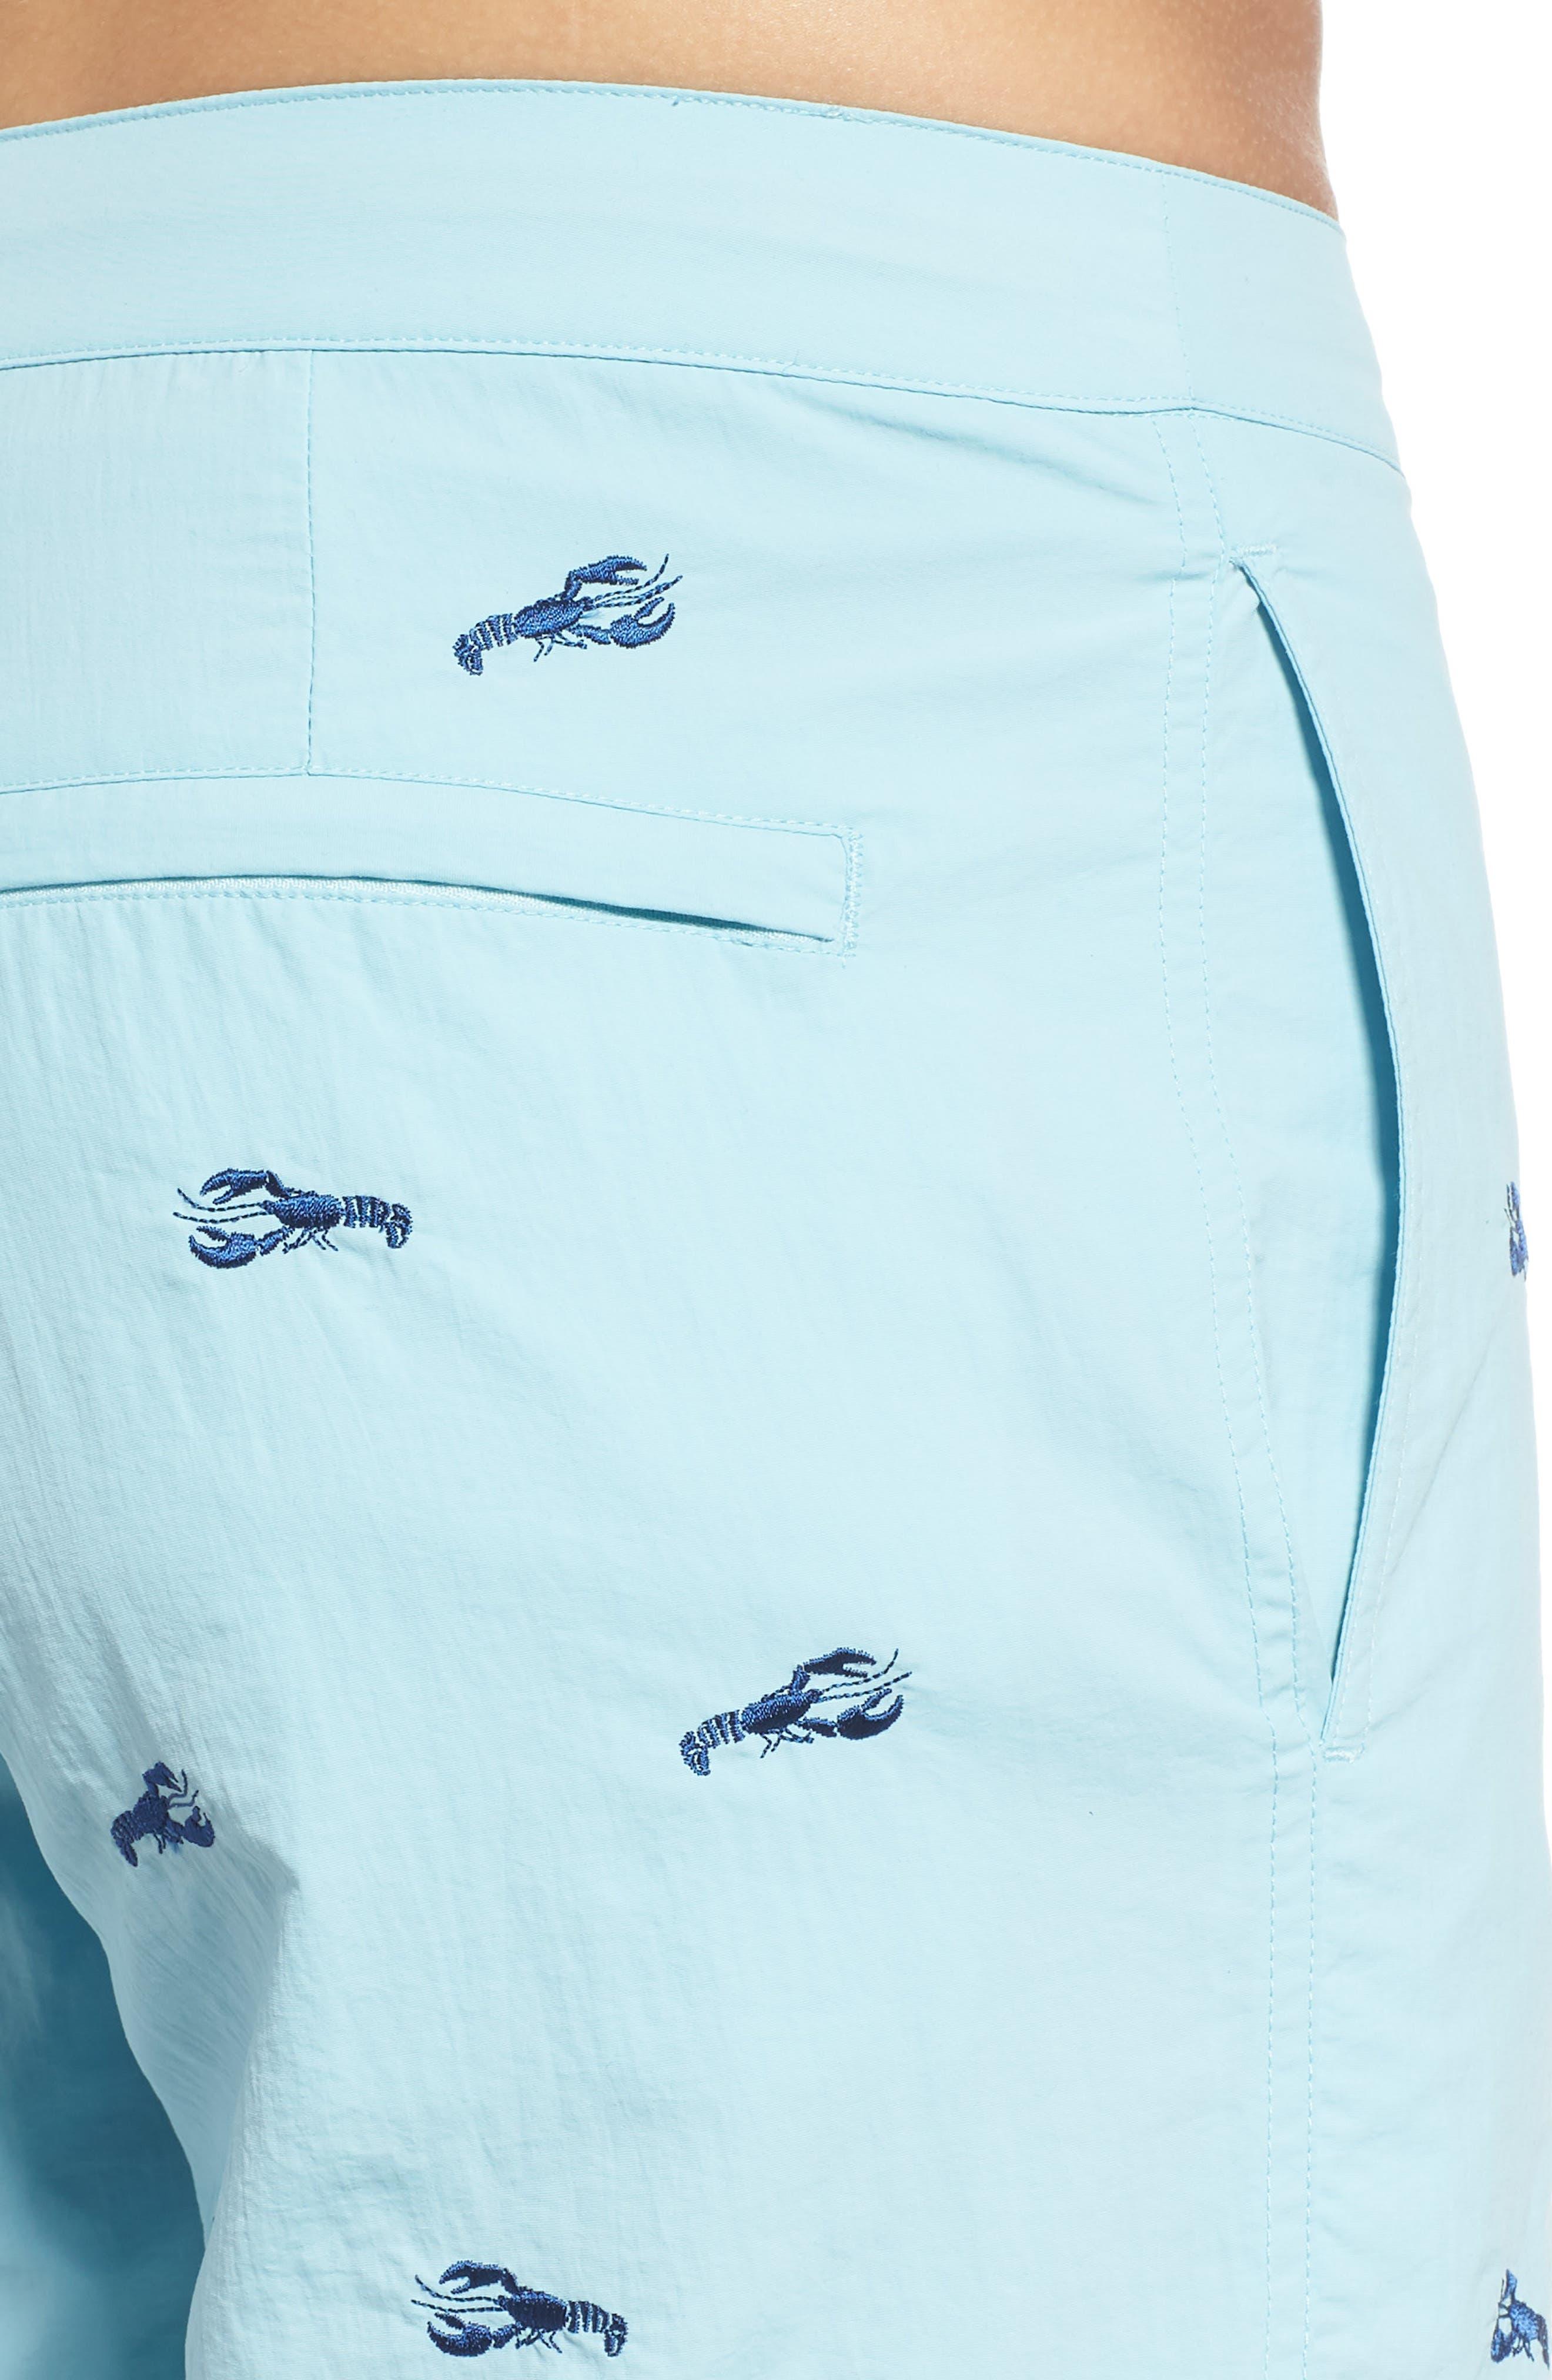 Aruba Embroidered Lobster Swim Trunks,                             Alternate thumbnail 4, color,                             AQUA EMBROIDERED LOBSTERS